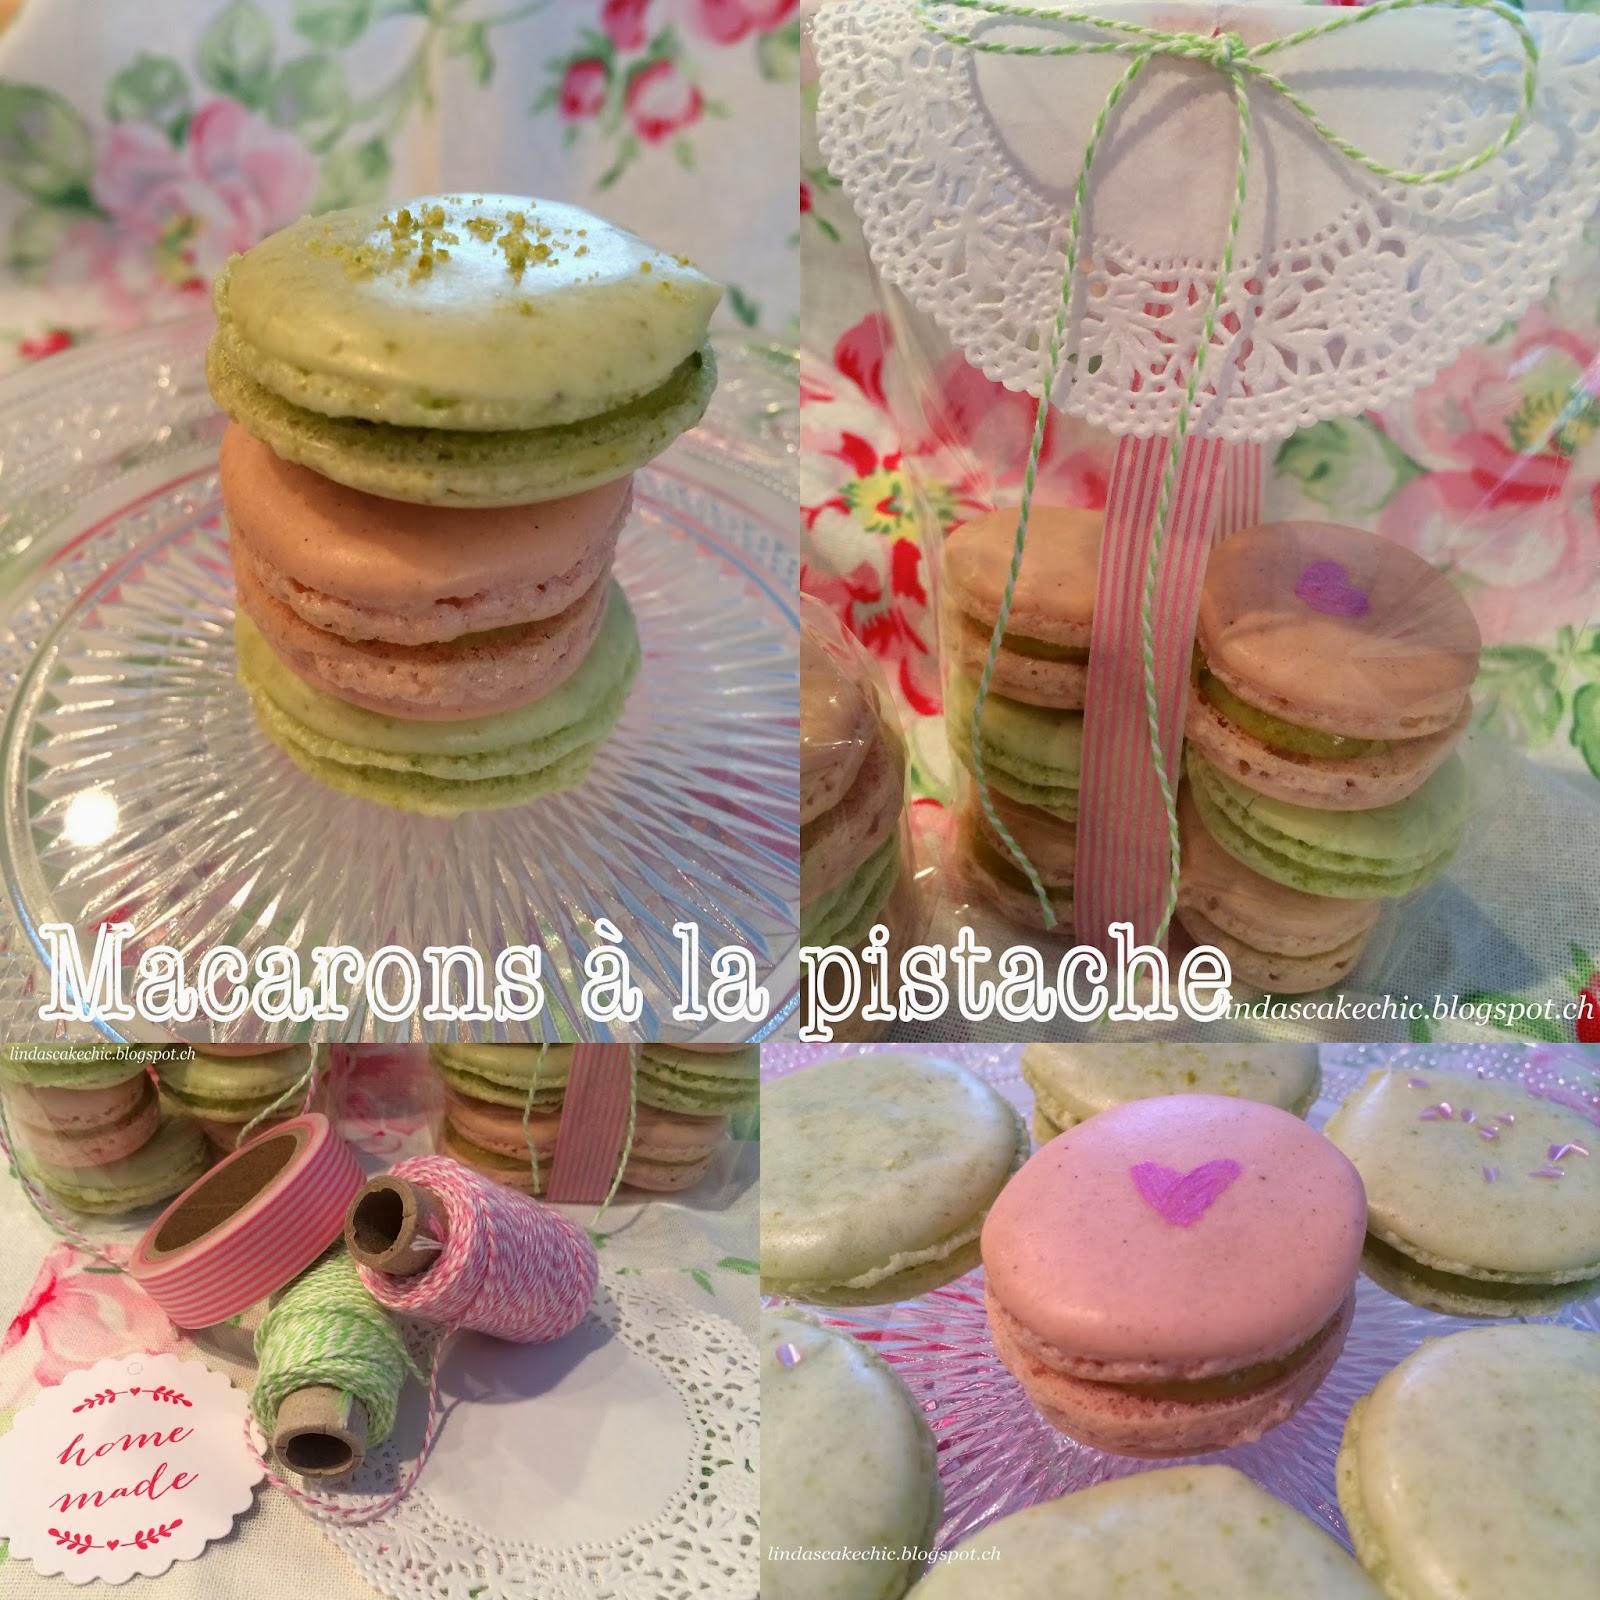 lindas cake chic macarons la pistache. Black Bedroom Furniture Sets. Home Design Ideas